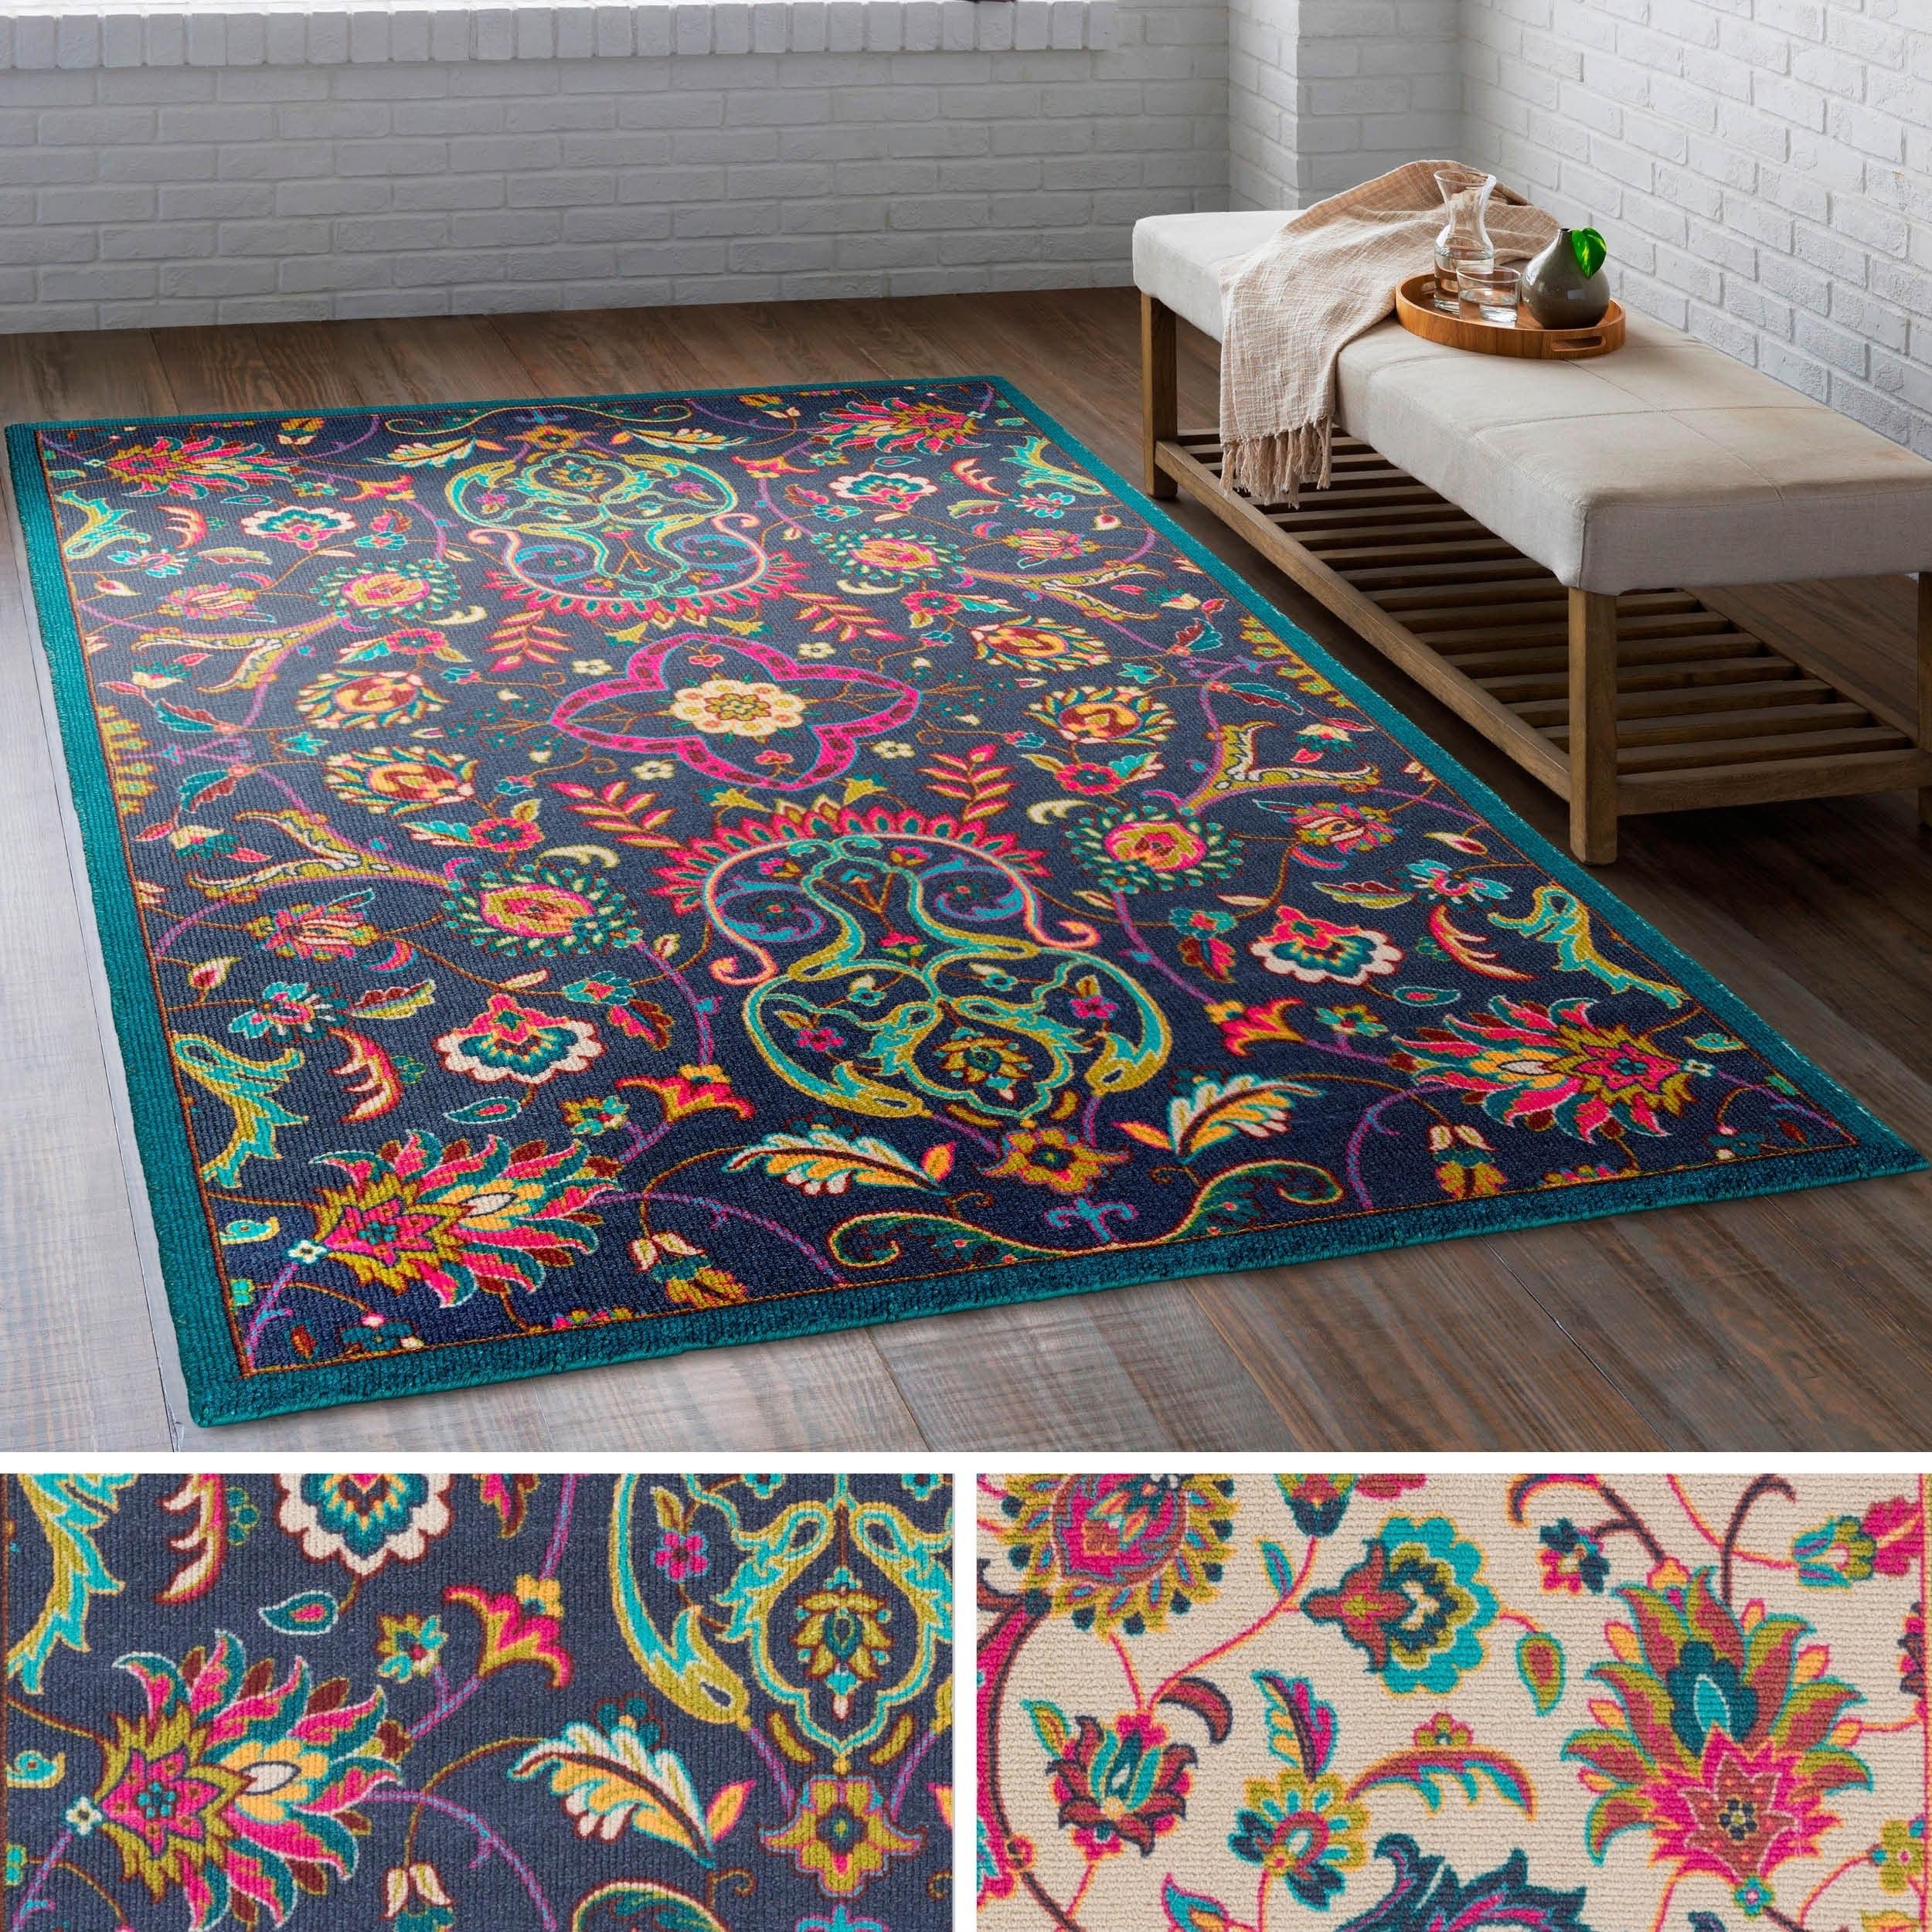 safavieh woven of carpets hand rugs throughout walmart inspirations wooljute area nelson wool rug jute bohemian